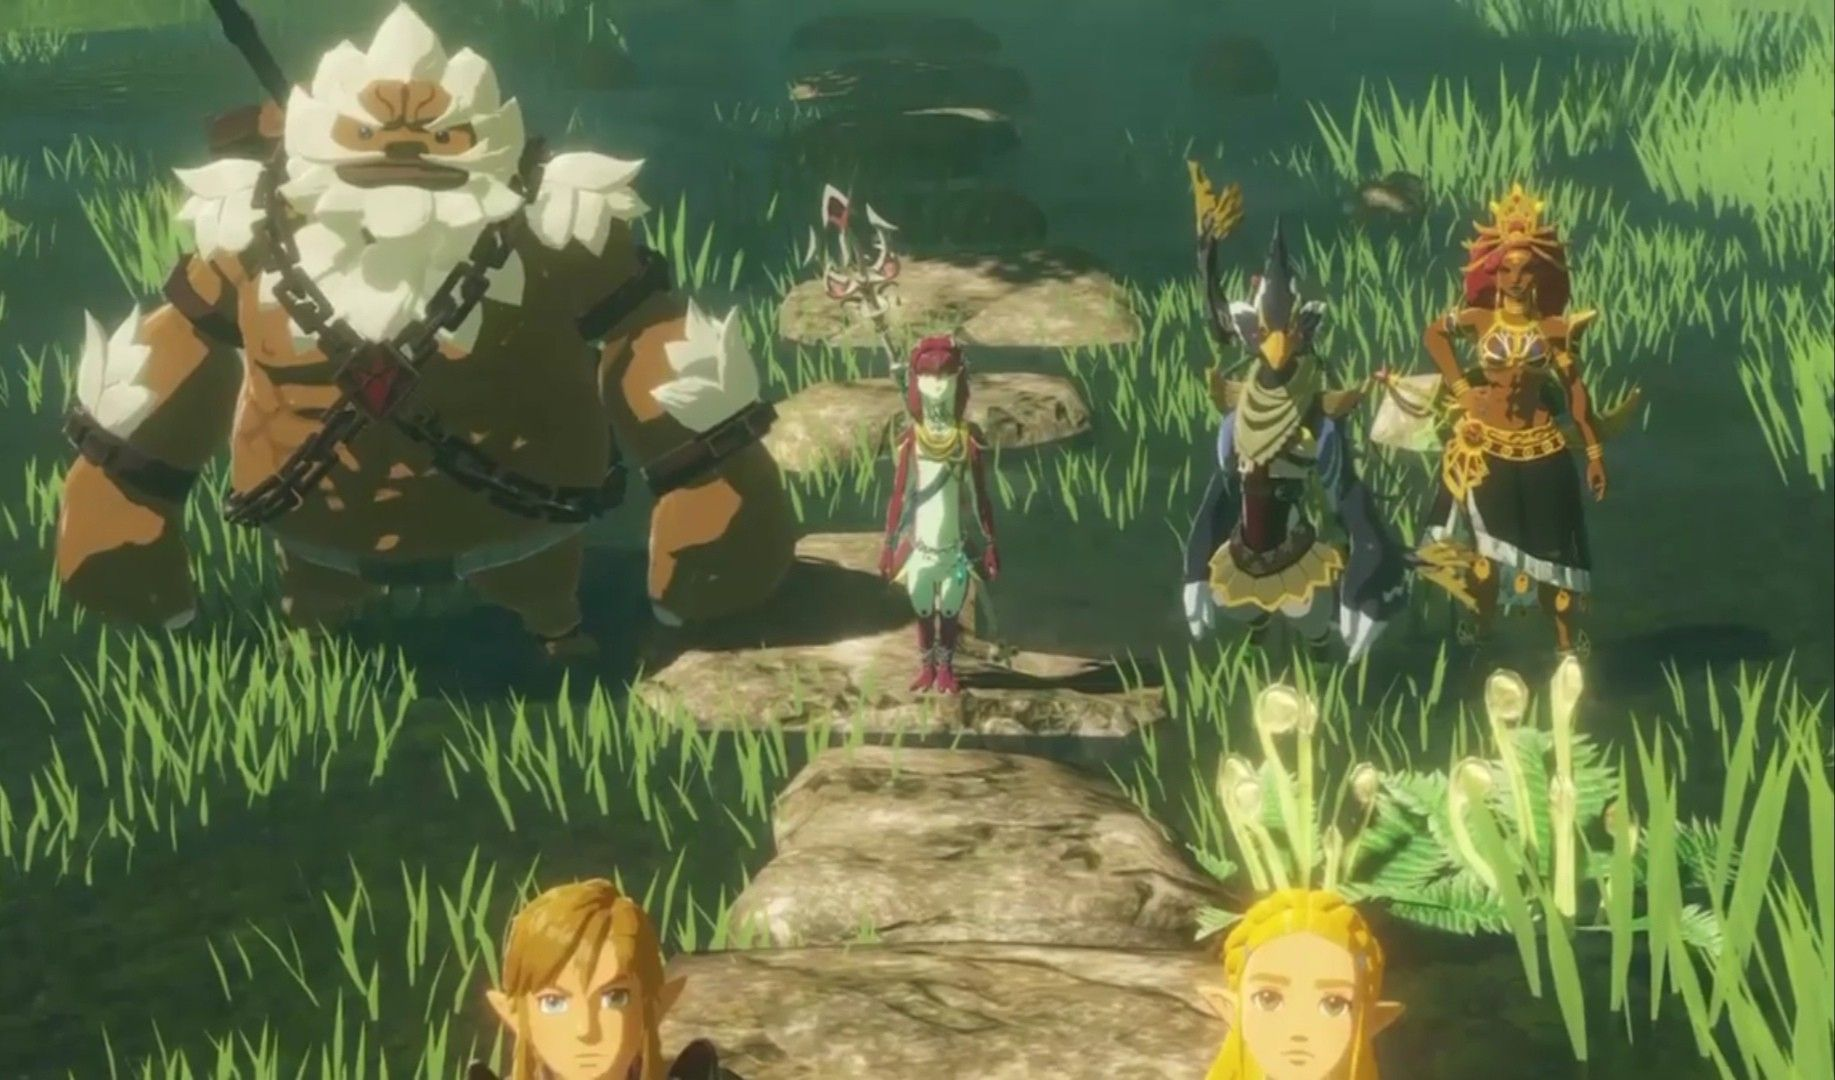 Н'𝐇𝐀𝐌𝐏𝐈𝐎𝐍𝐒 Age Of Calamity Hyrule Warriors Legend Of Zelda Breath Breath Of The Wild